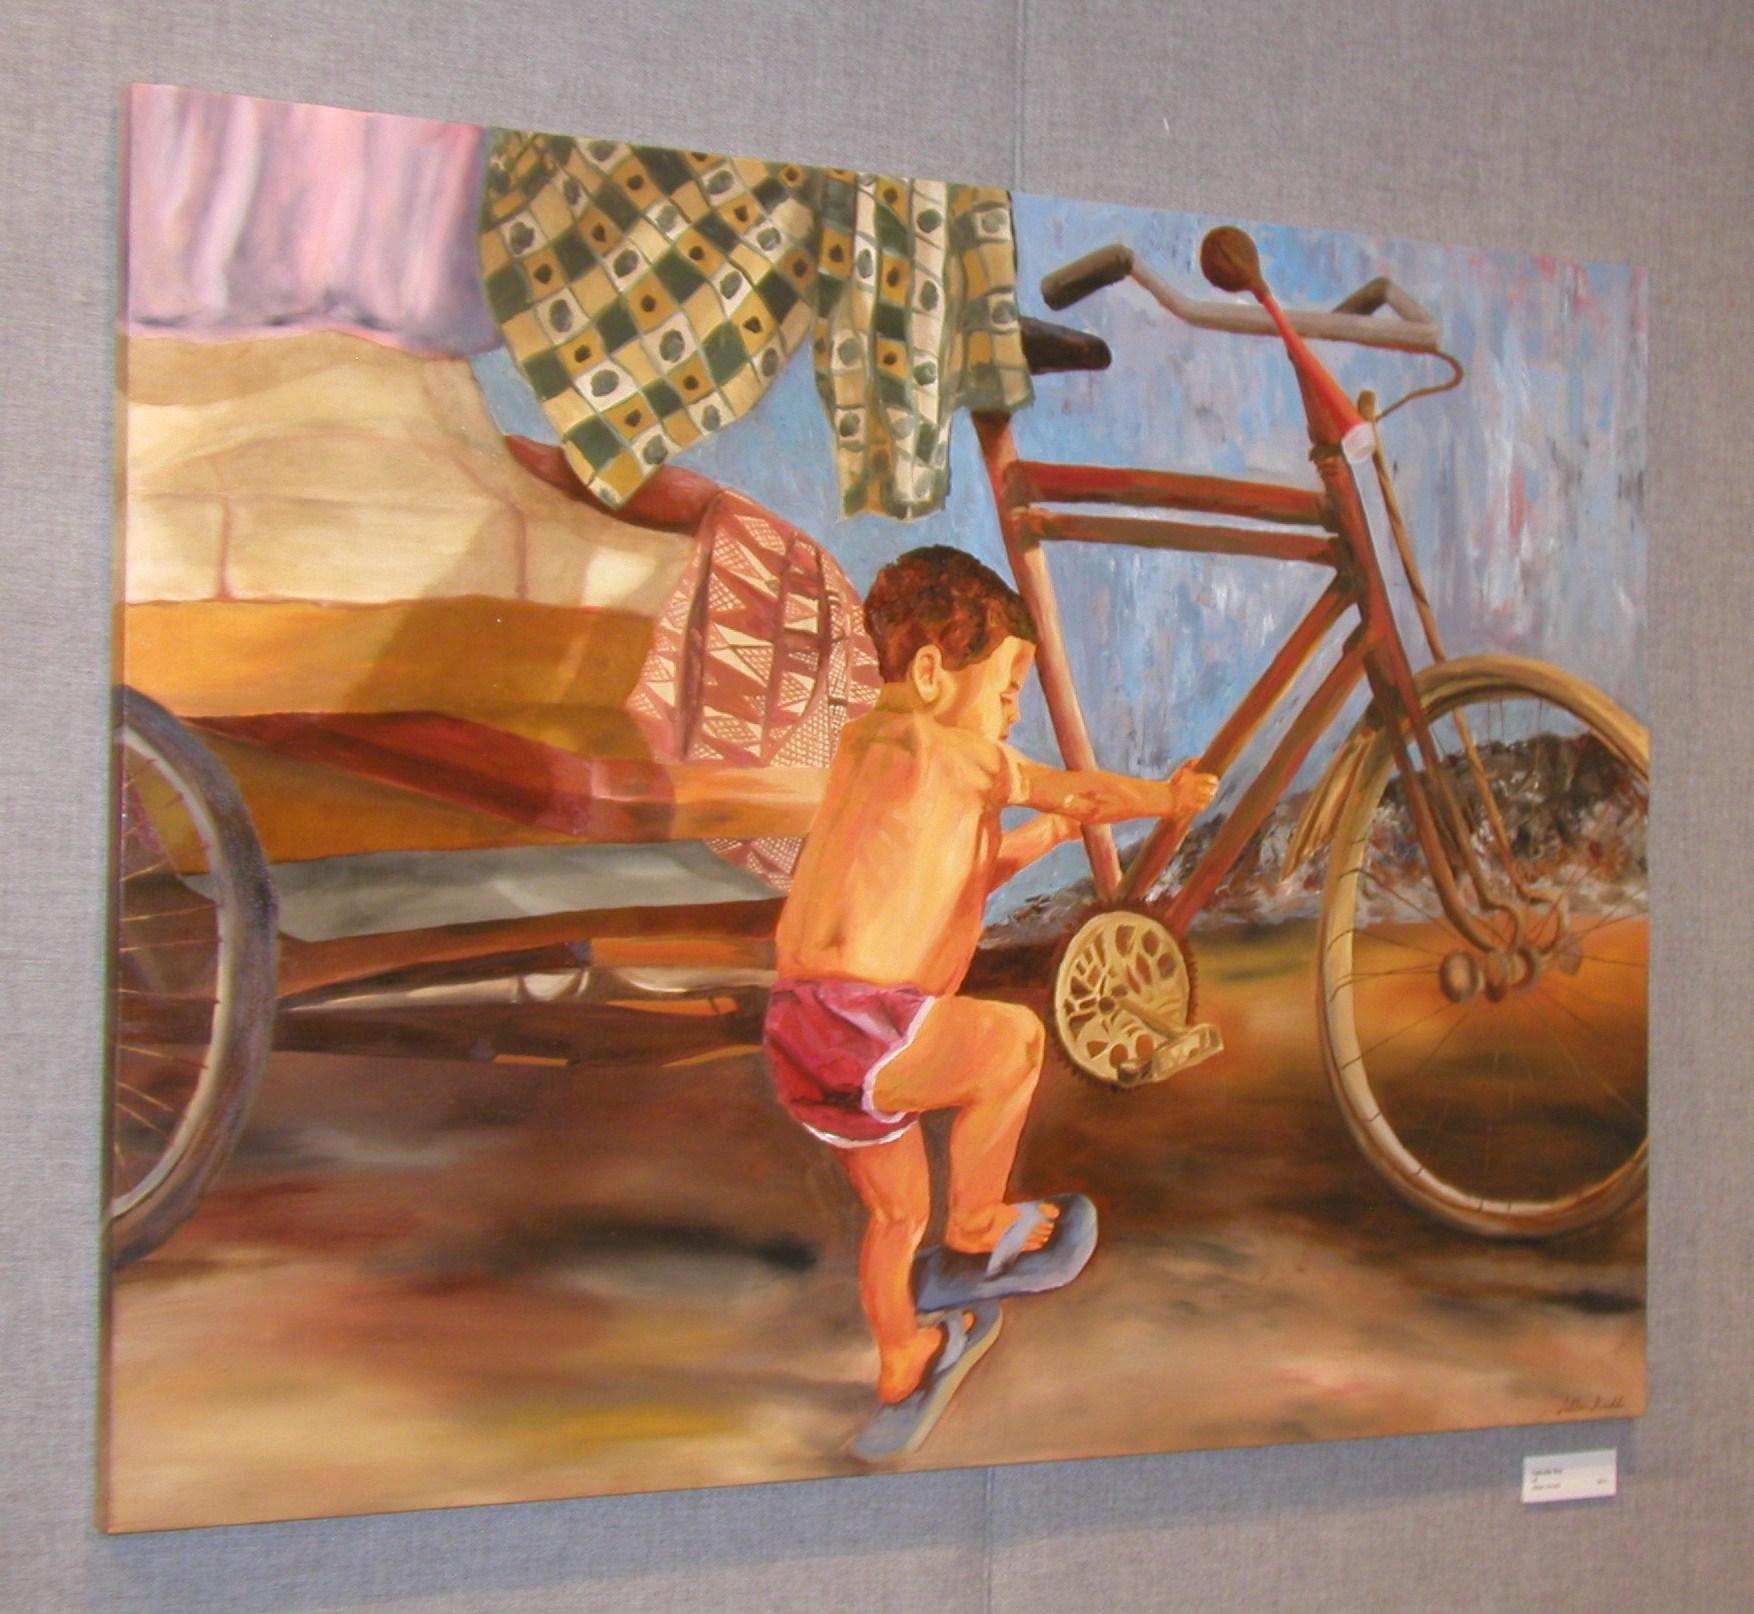 Calcutta Boy. oil on canvas, 36 x 48 inches. 2005